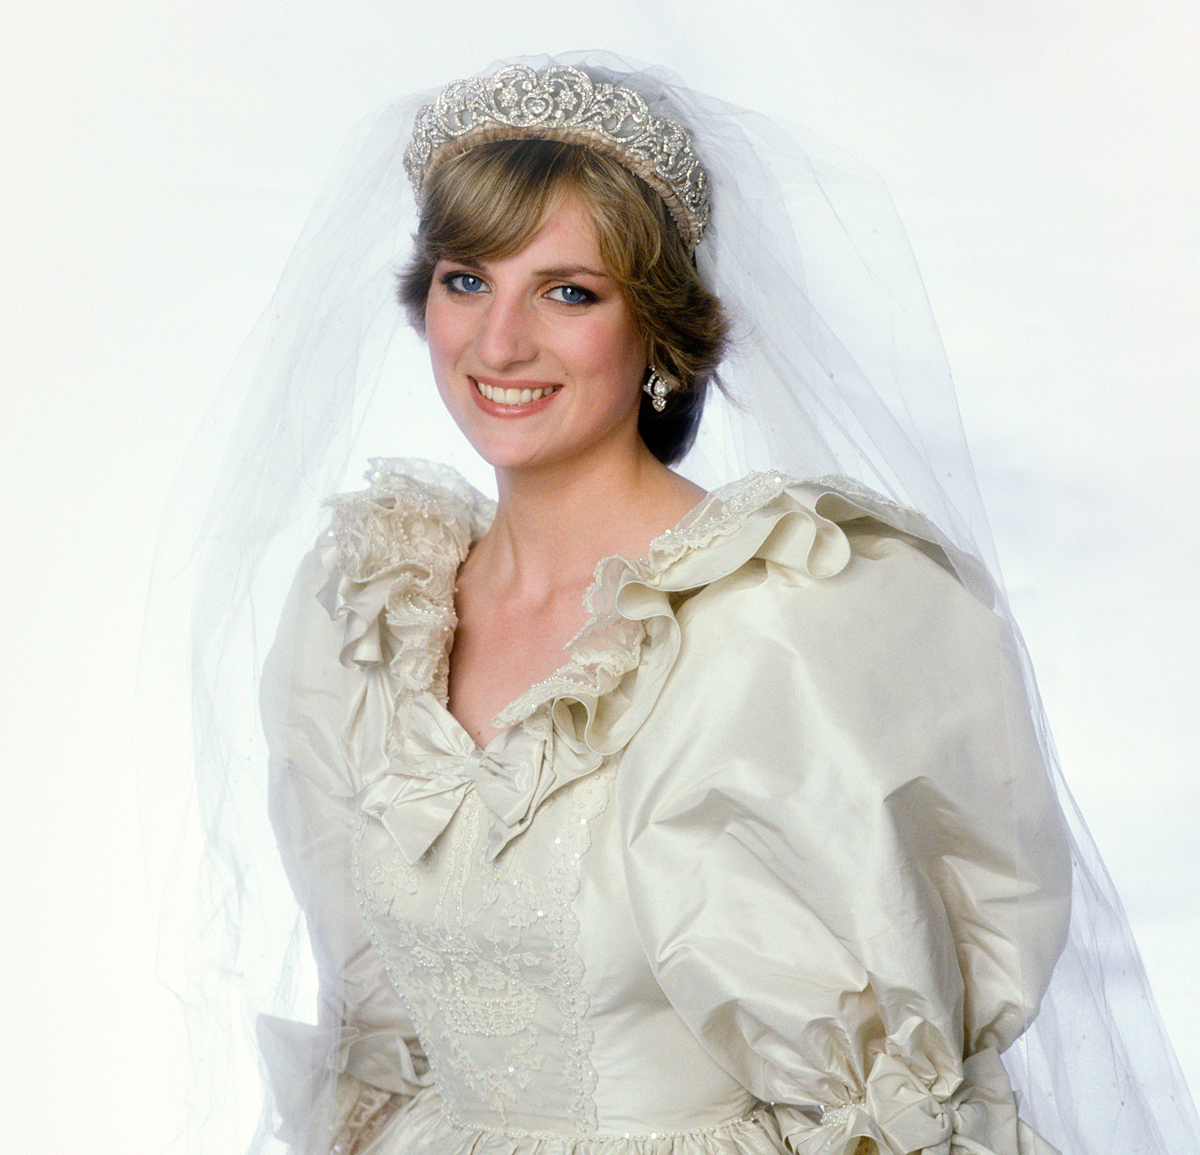 princess diana on her wedding day, 1981